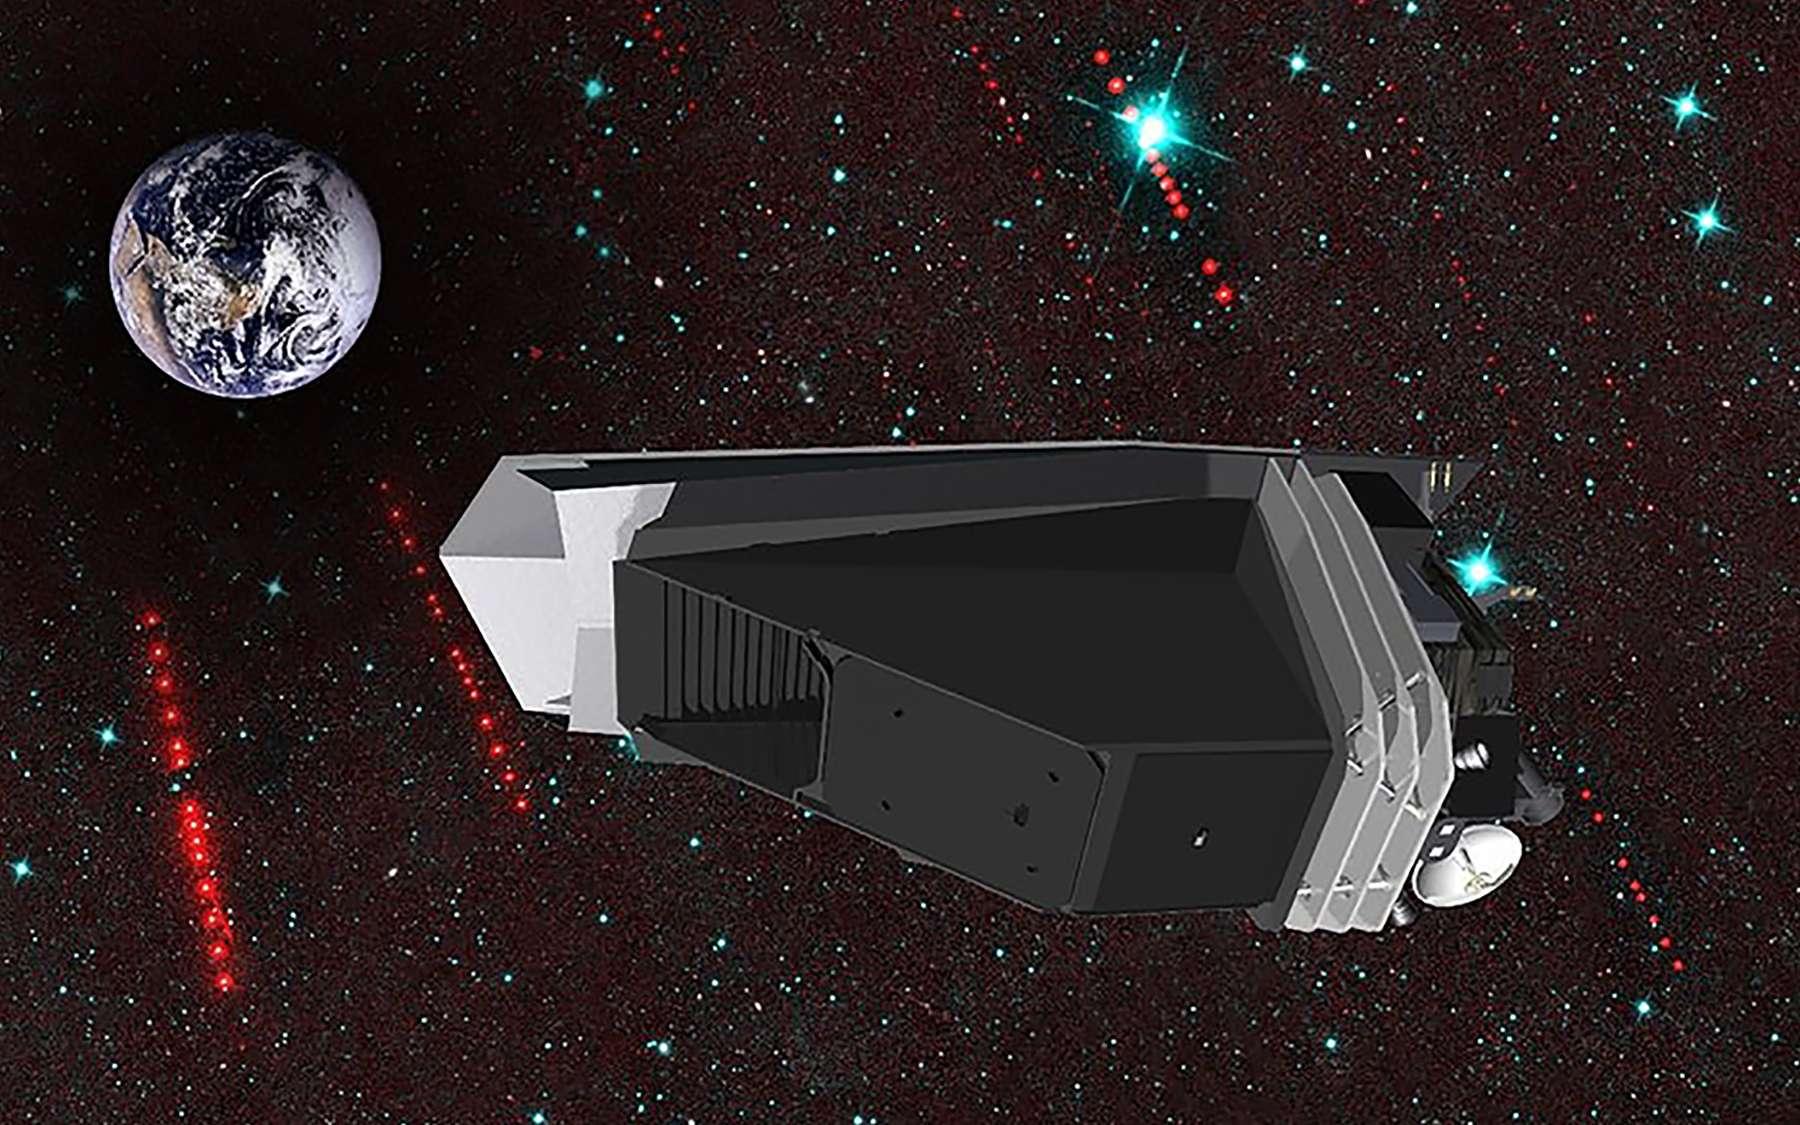 Vue d'artiste du satellite NEOcam de la Nasa. © Nasa, JPL-Caltech